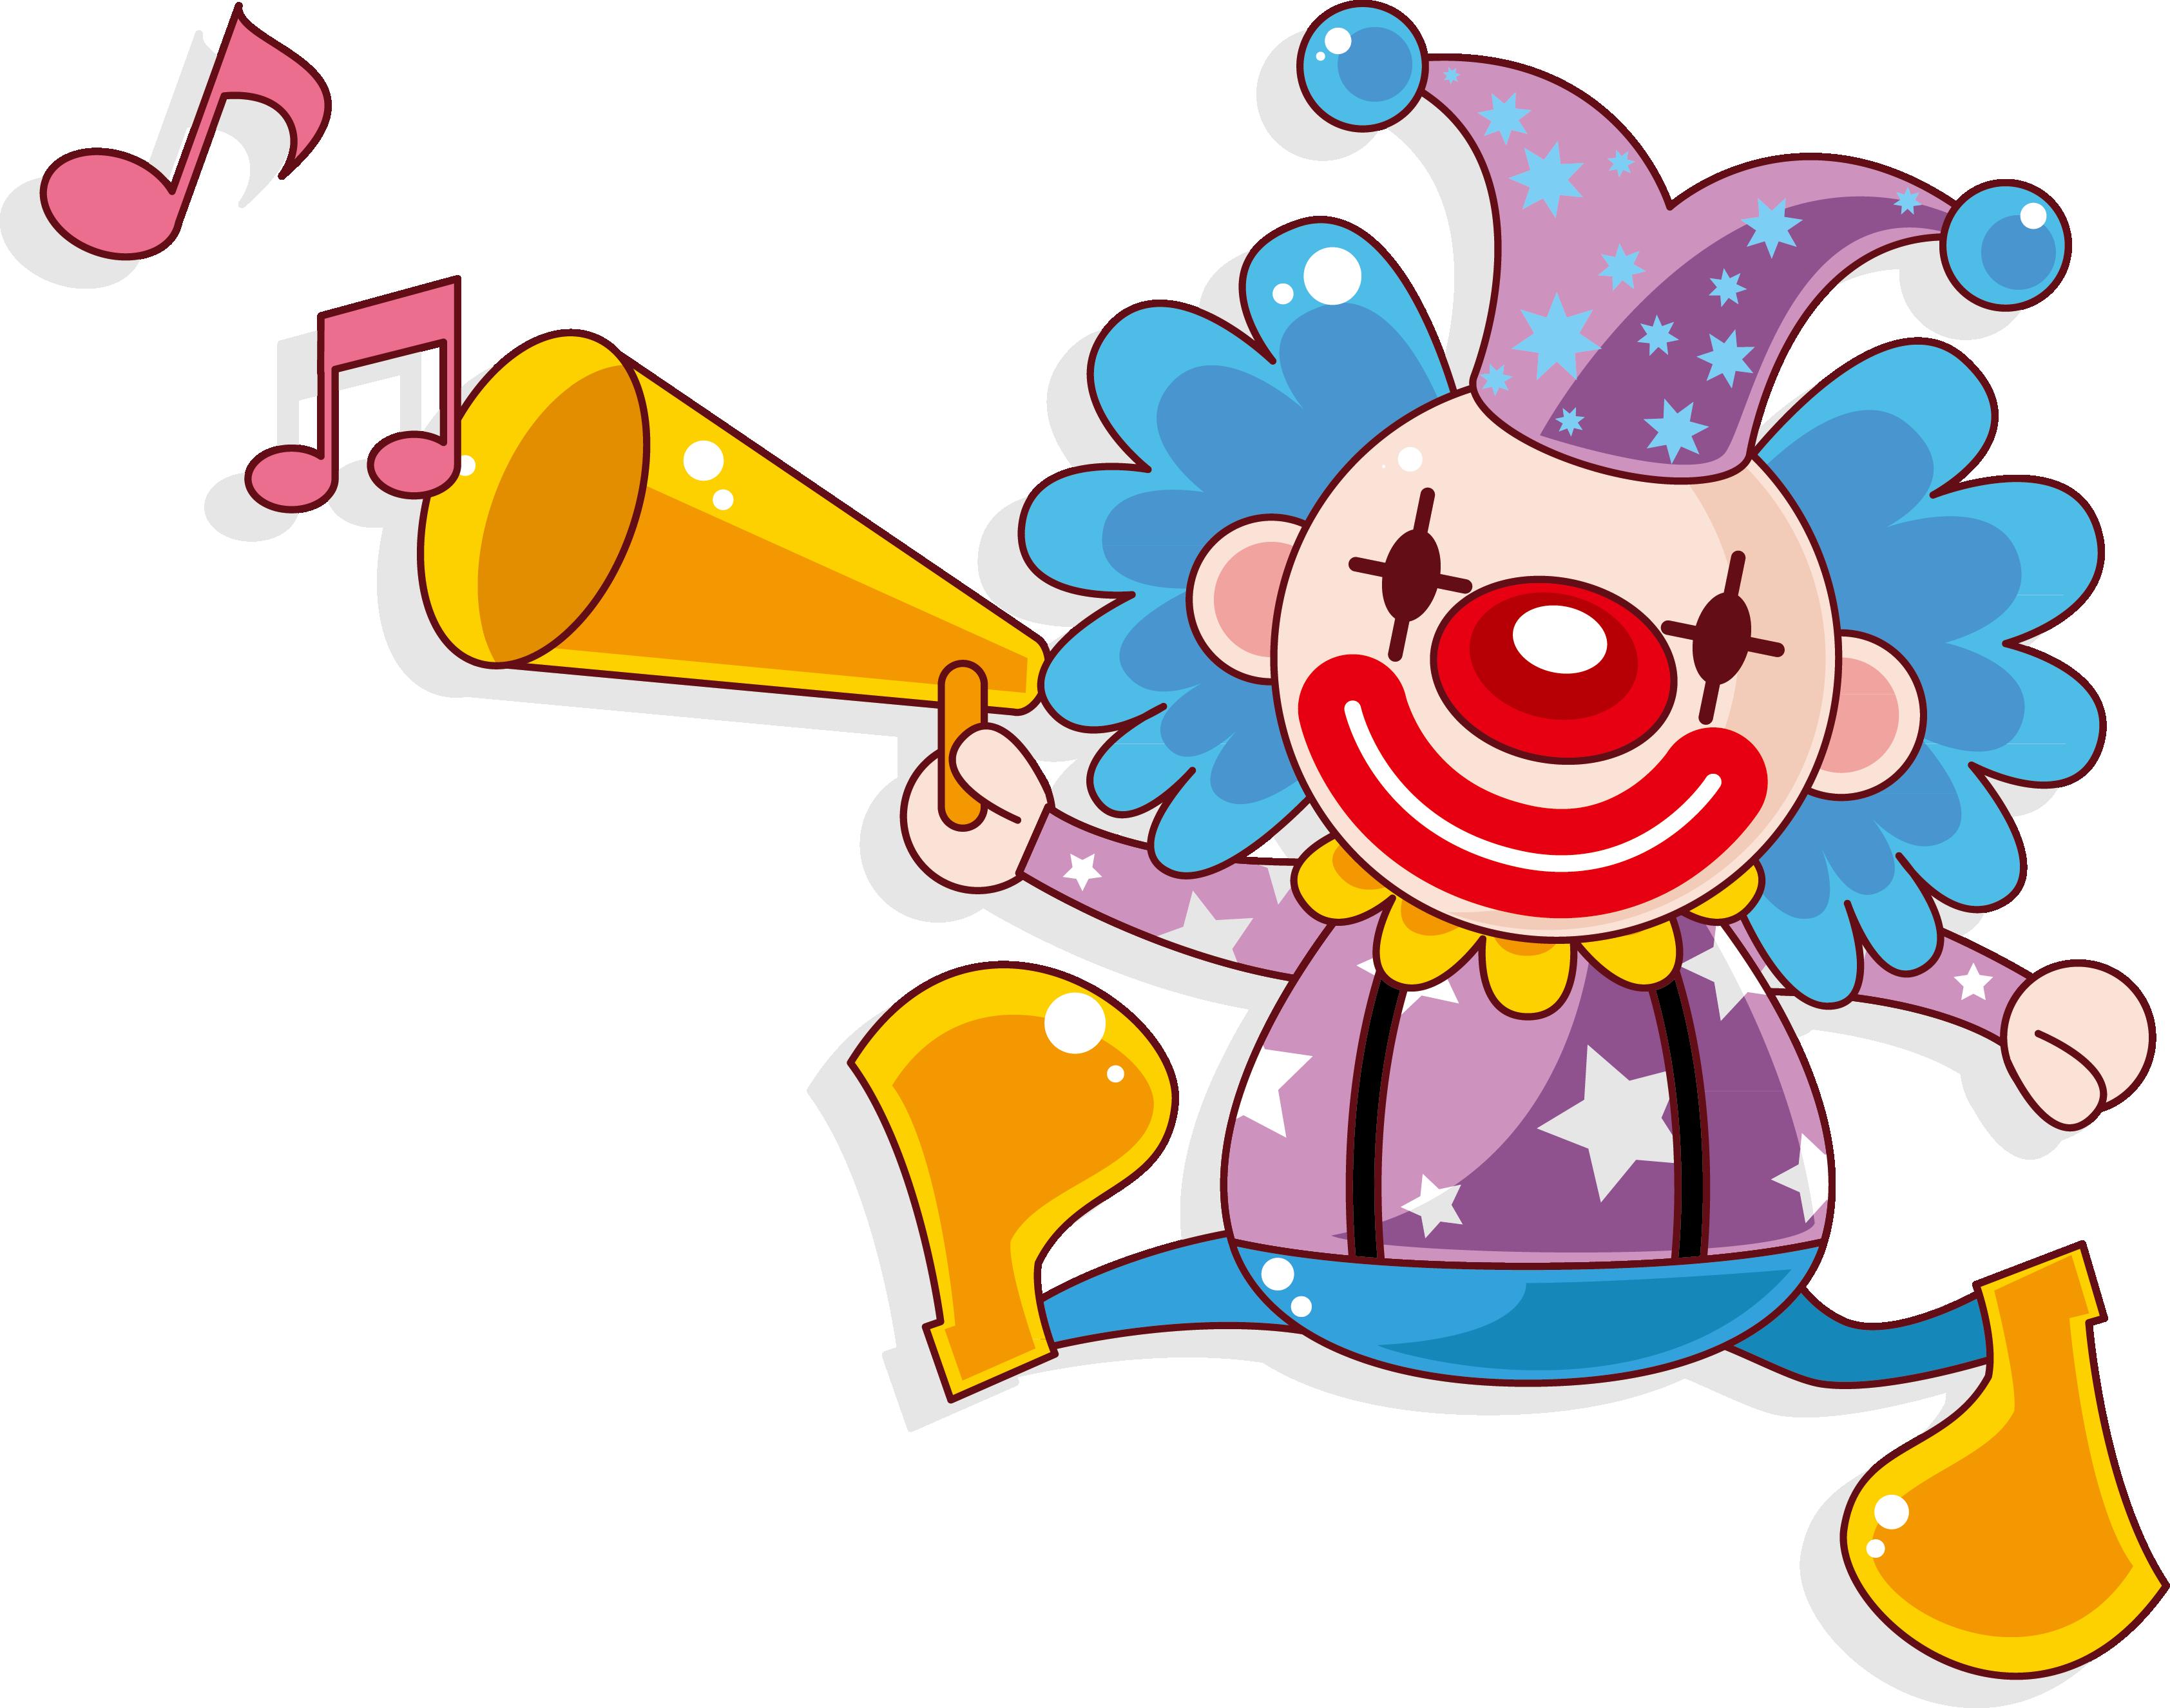 Horn clipart clown horn. Circus cartoon acrobatic performance